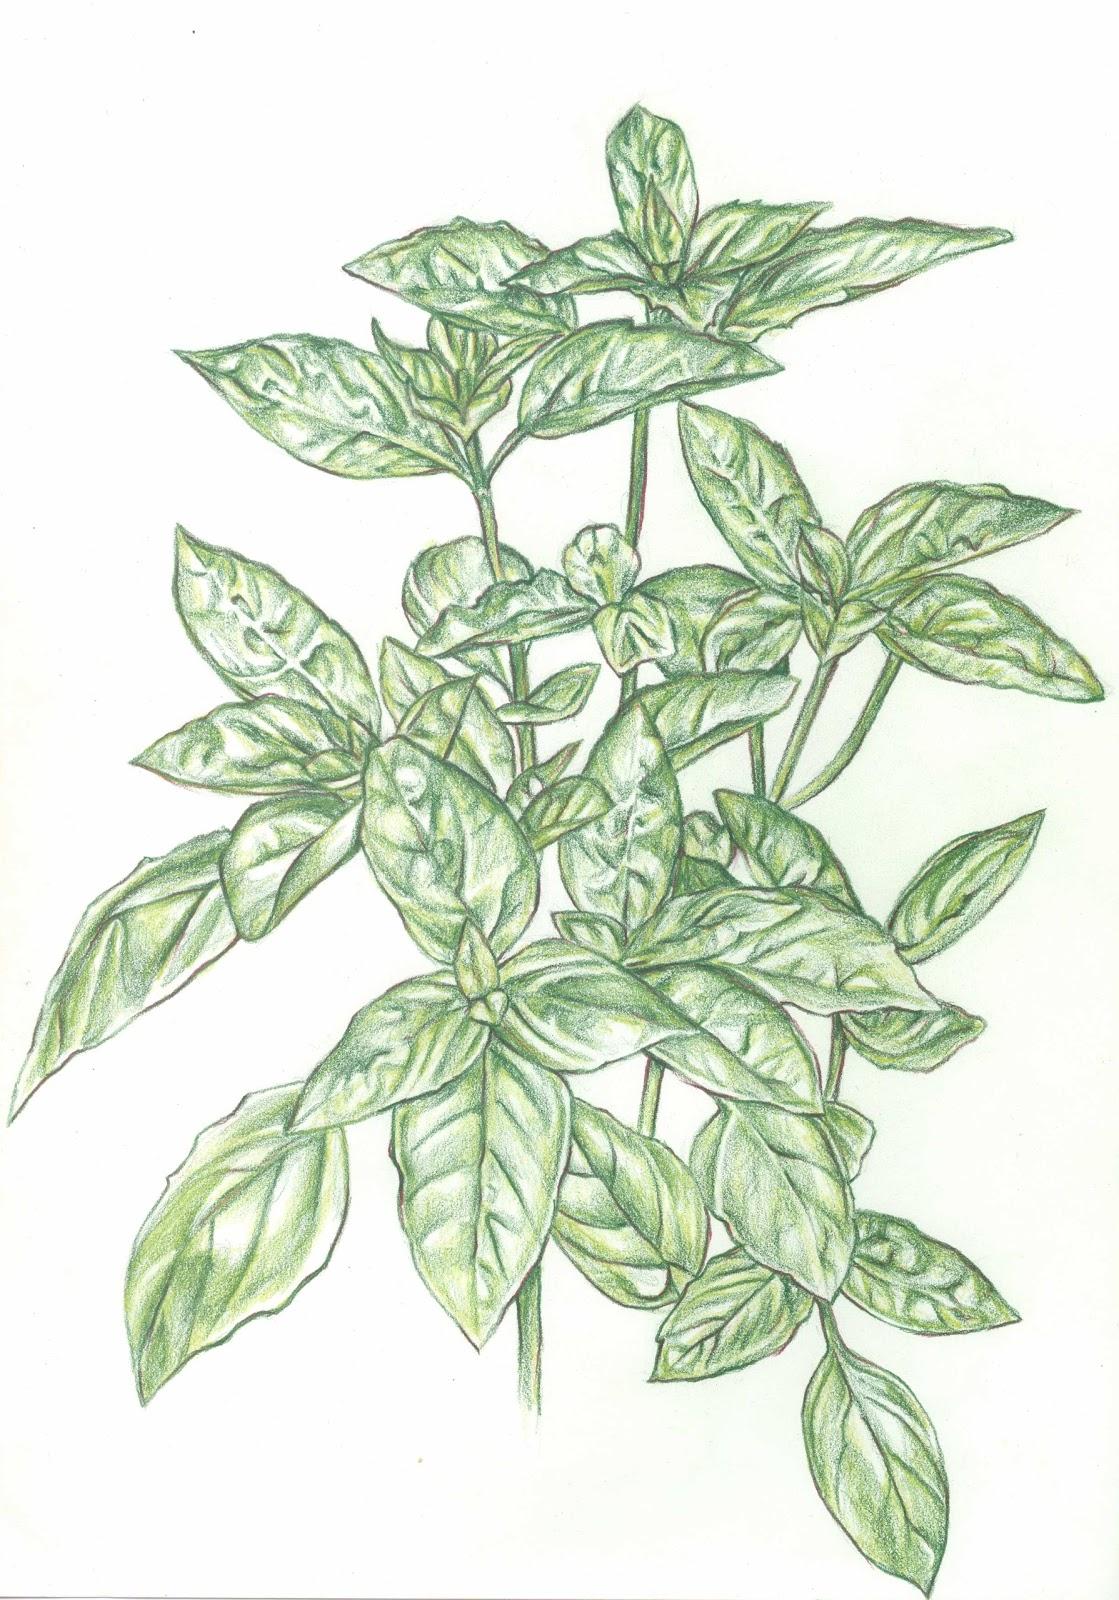 1119x1600 Jessie's Art An Old Genovese Sweet Basil Illustration